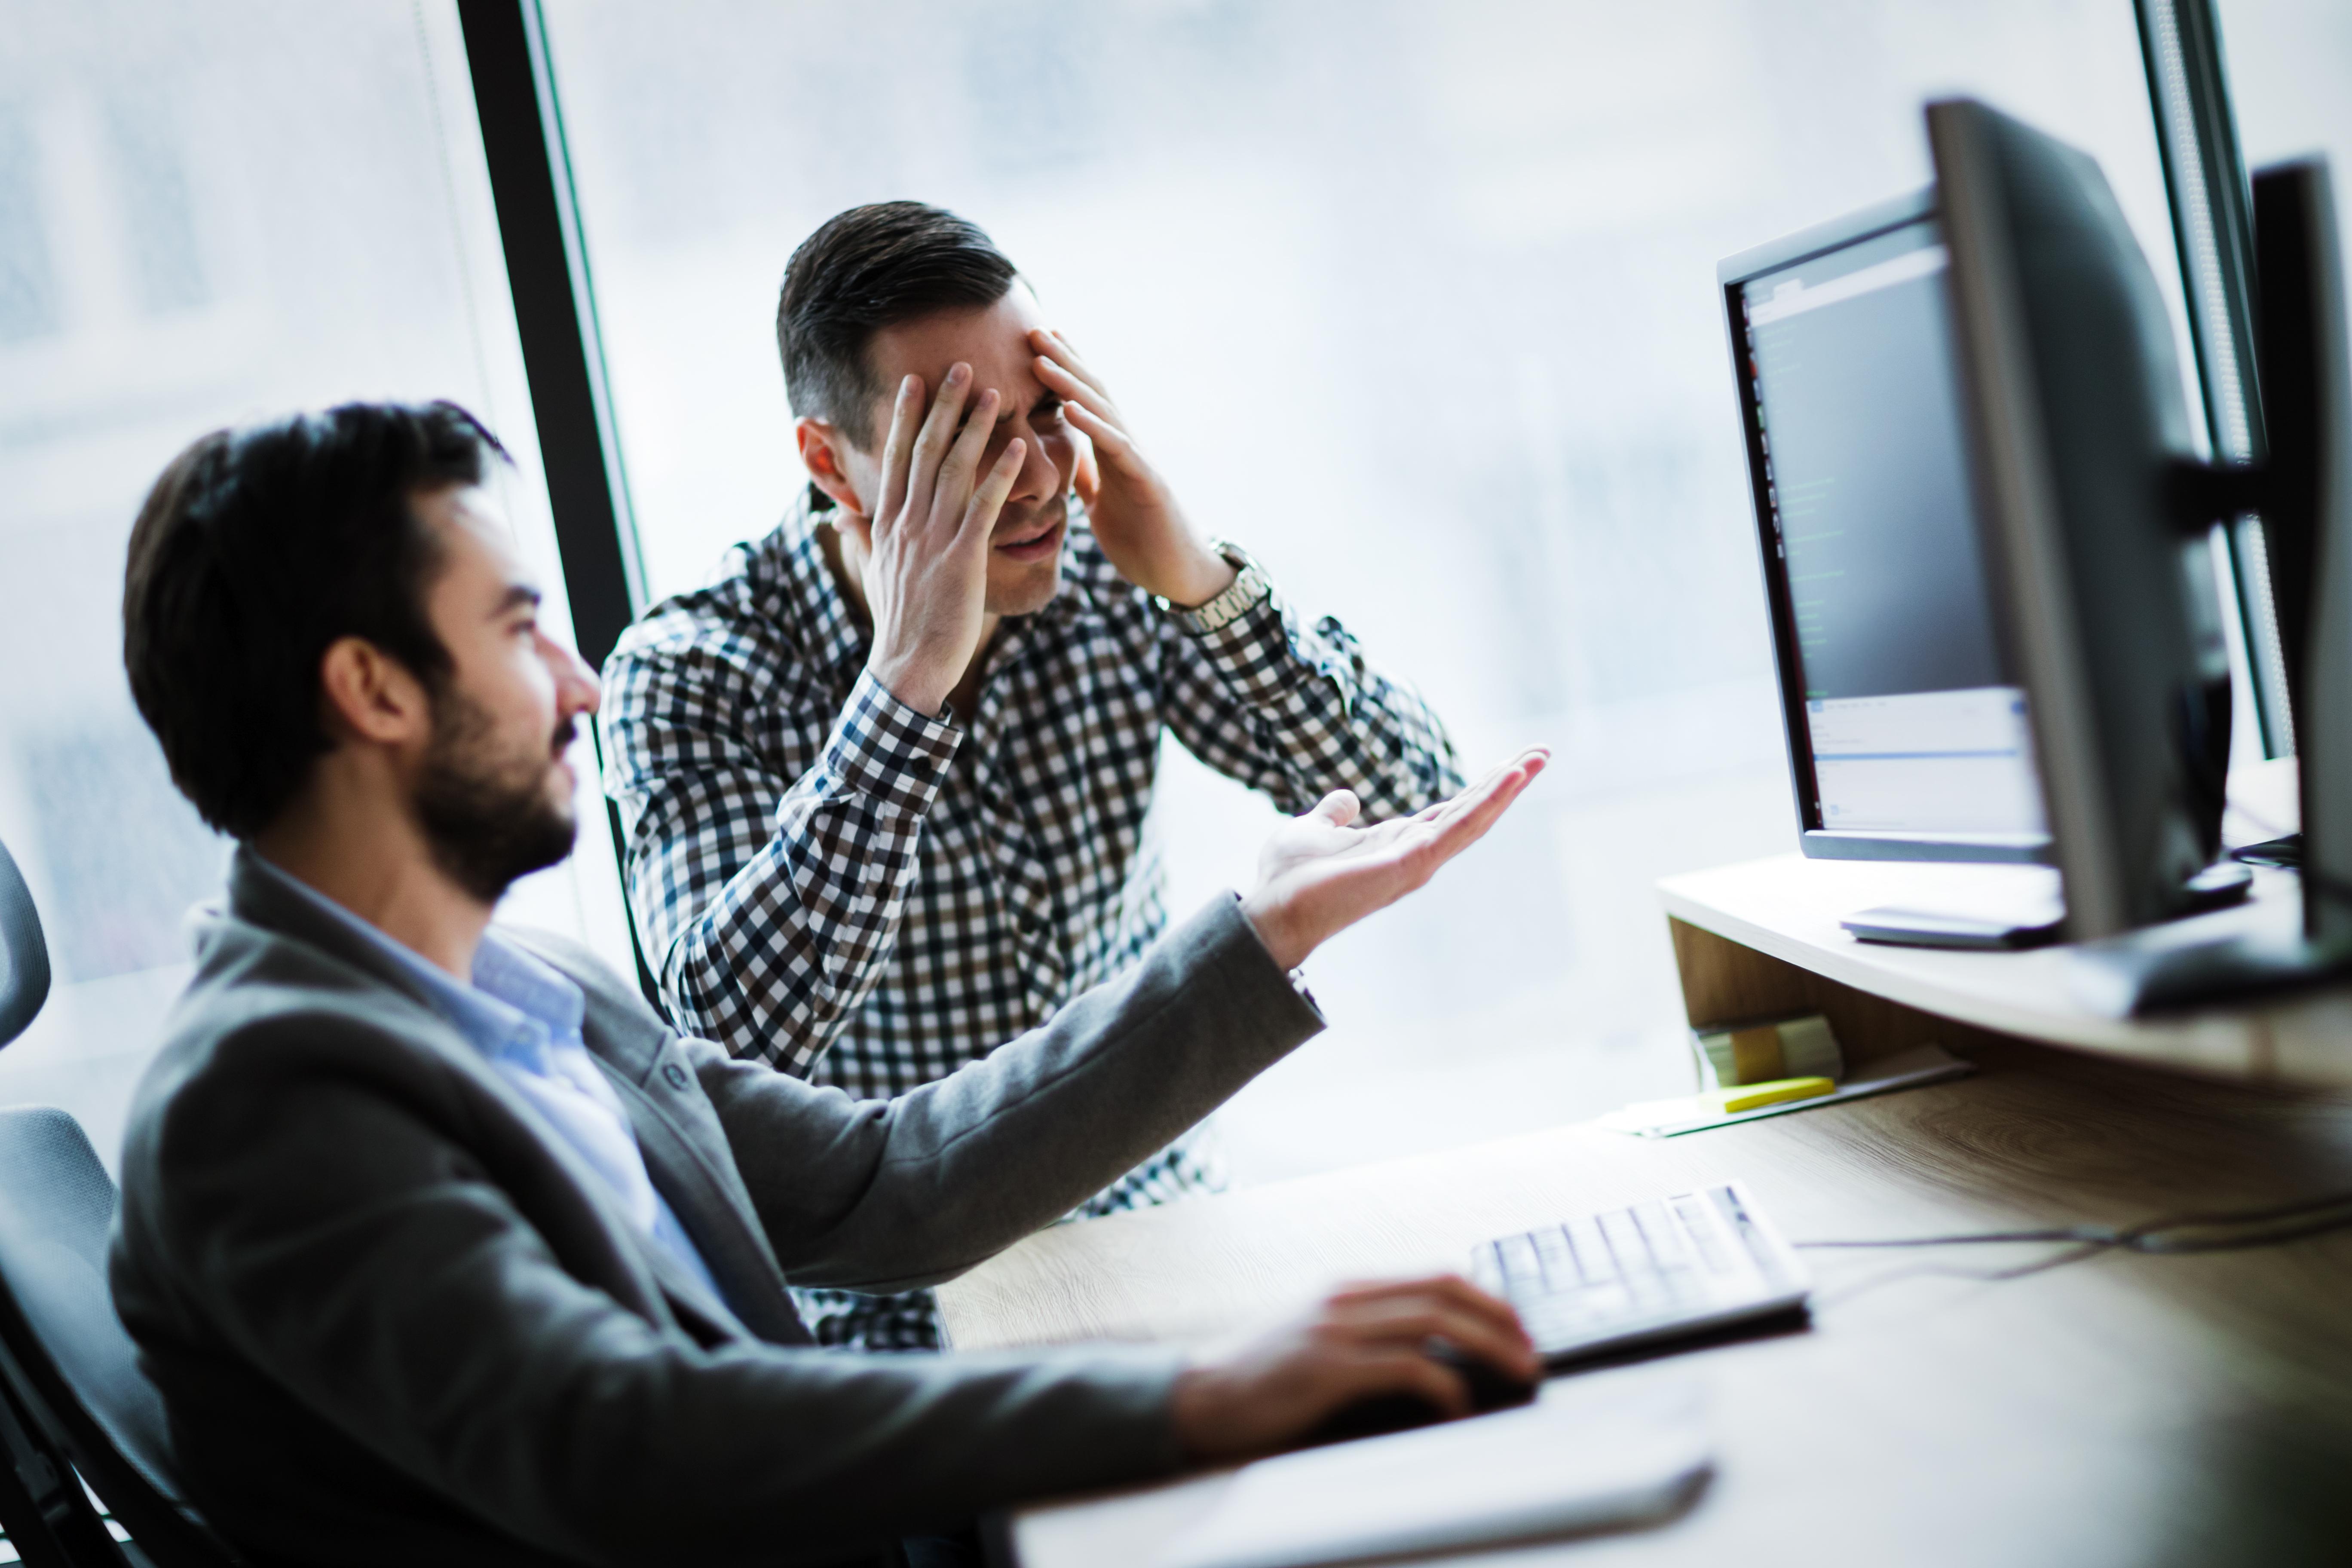 Factors that determine a substandard law firm